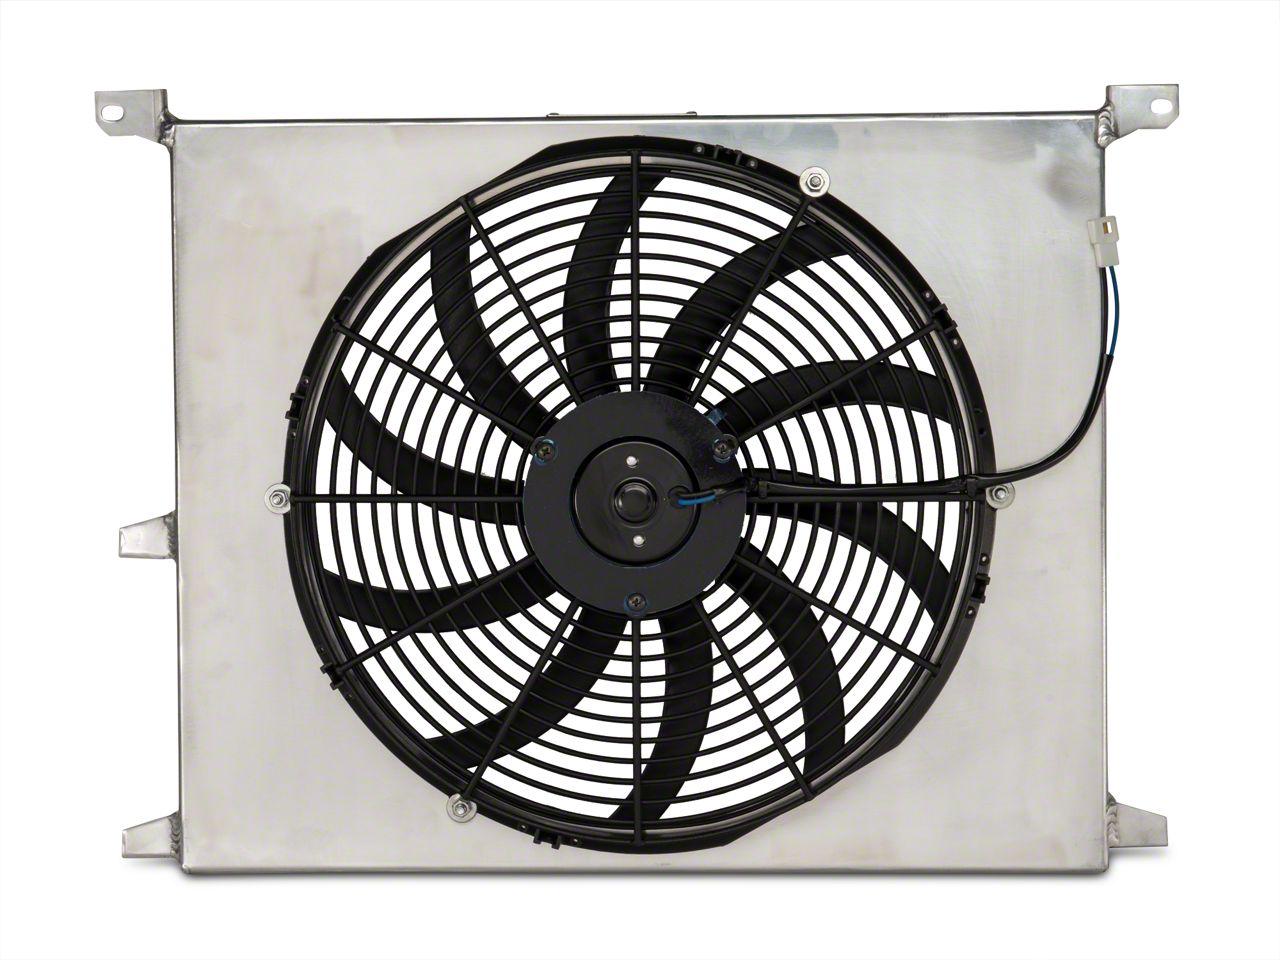 SR Performance Universal 16 in. High Performance Slim Electric Radiator Fan w/ Shroud (79-19 All)